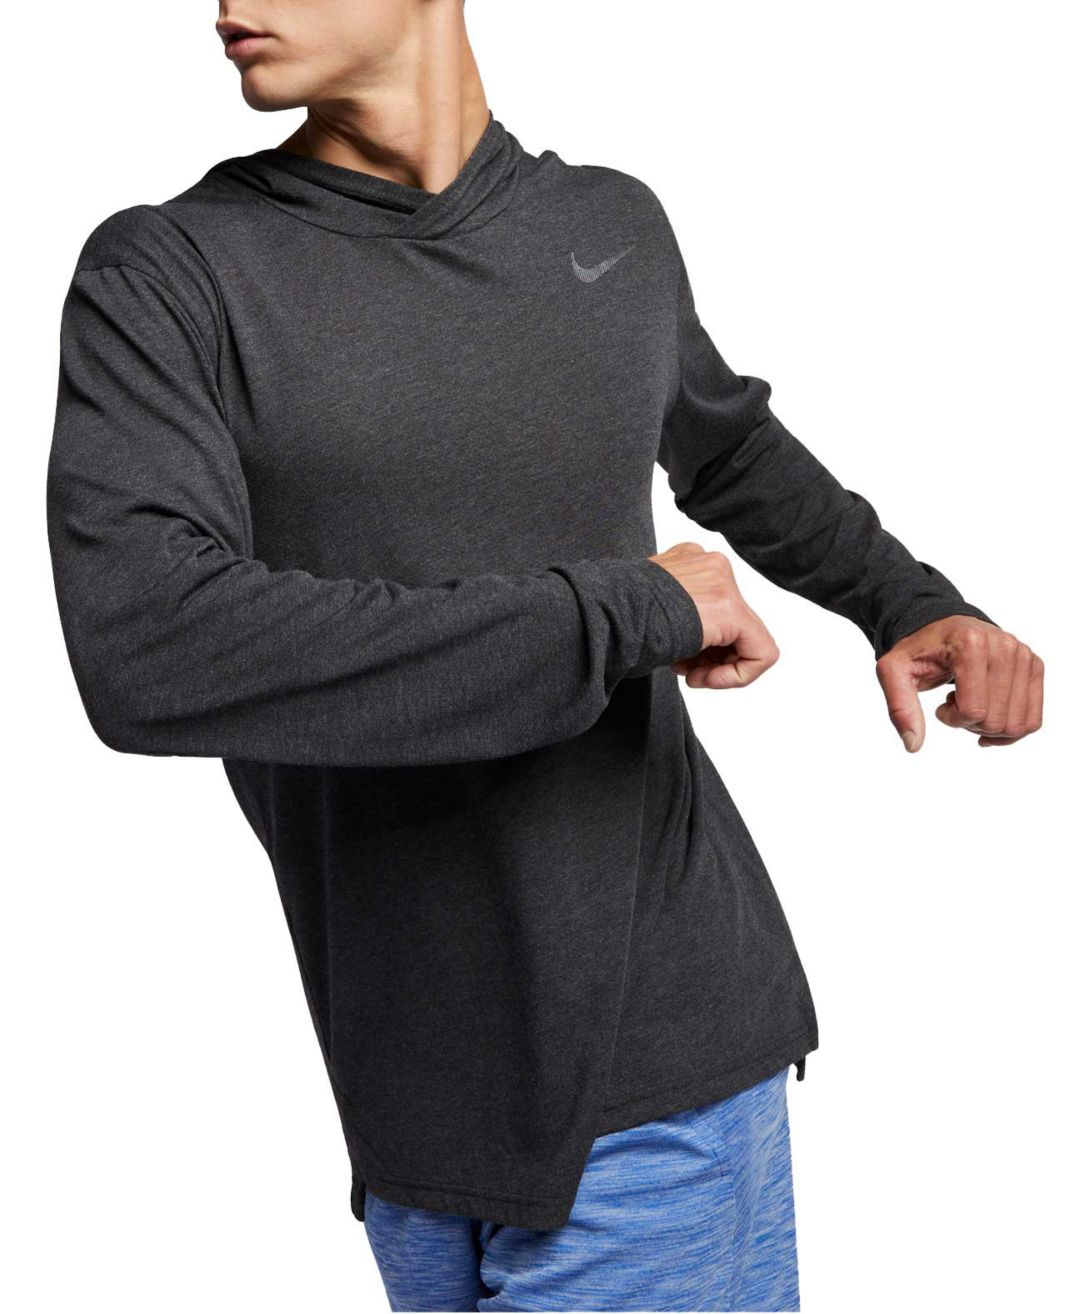 Nike Men's Hyper Dry Hooded Long Sleeve Shirt (Regular and Big & Tall)